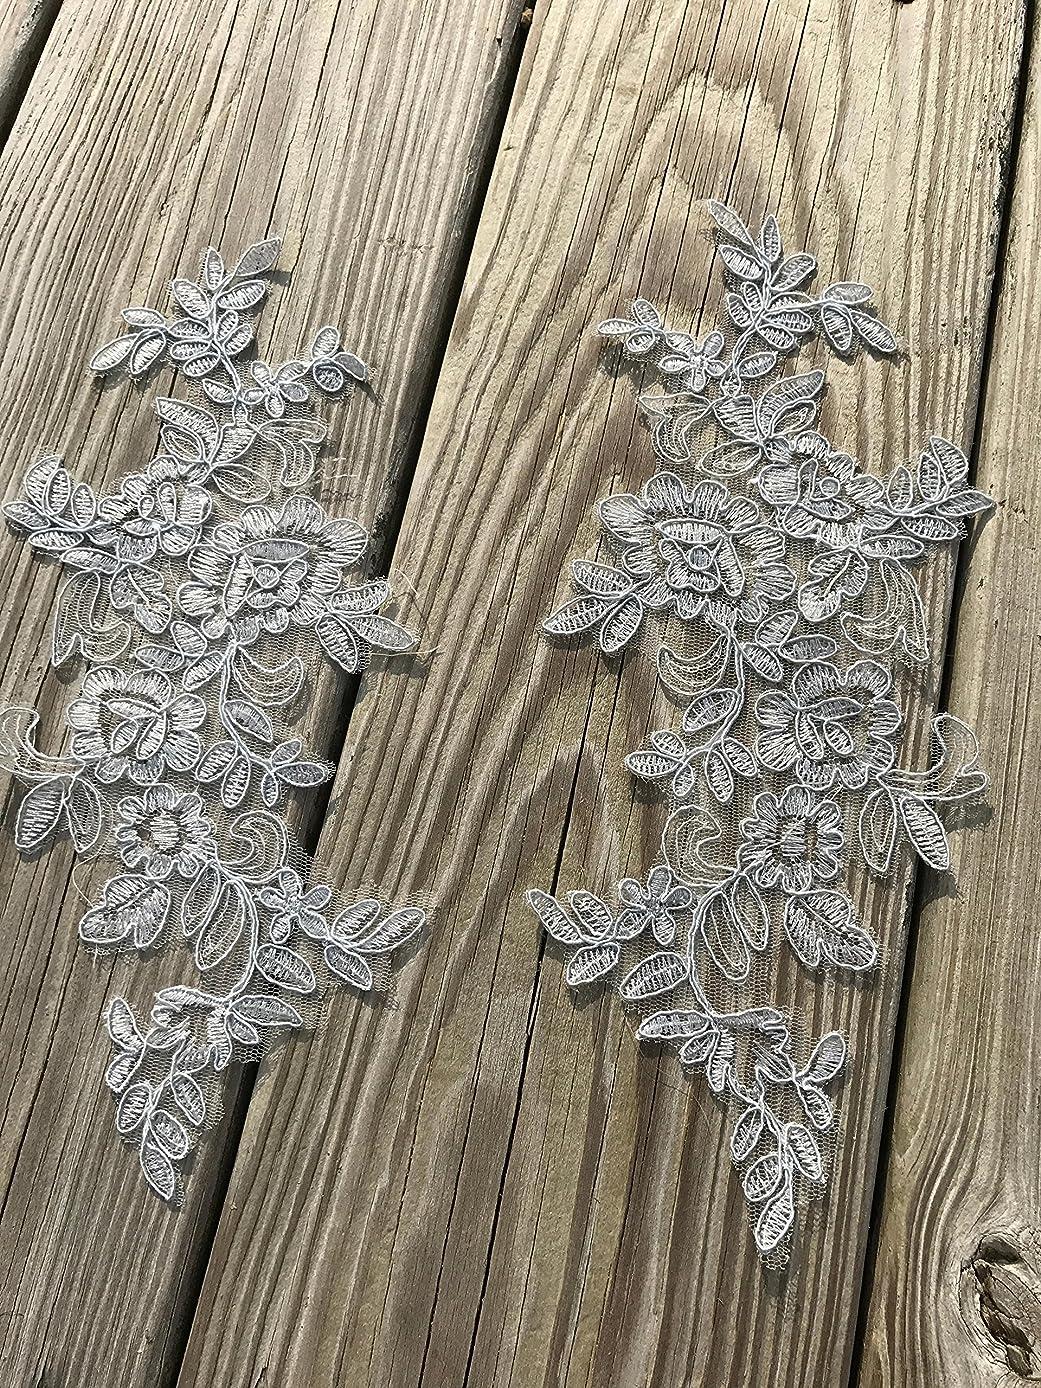 #127 TWO Pairs Lace Appliques ,Wedding Applique, Lace Appliques, Embroidered Appliques (Grey)